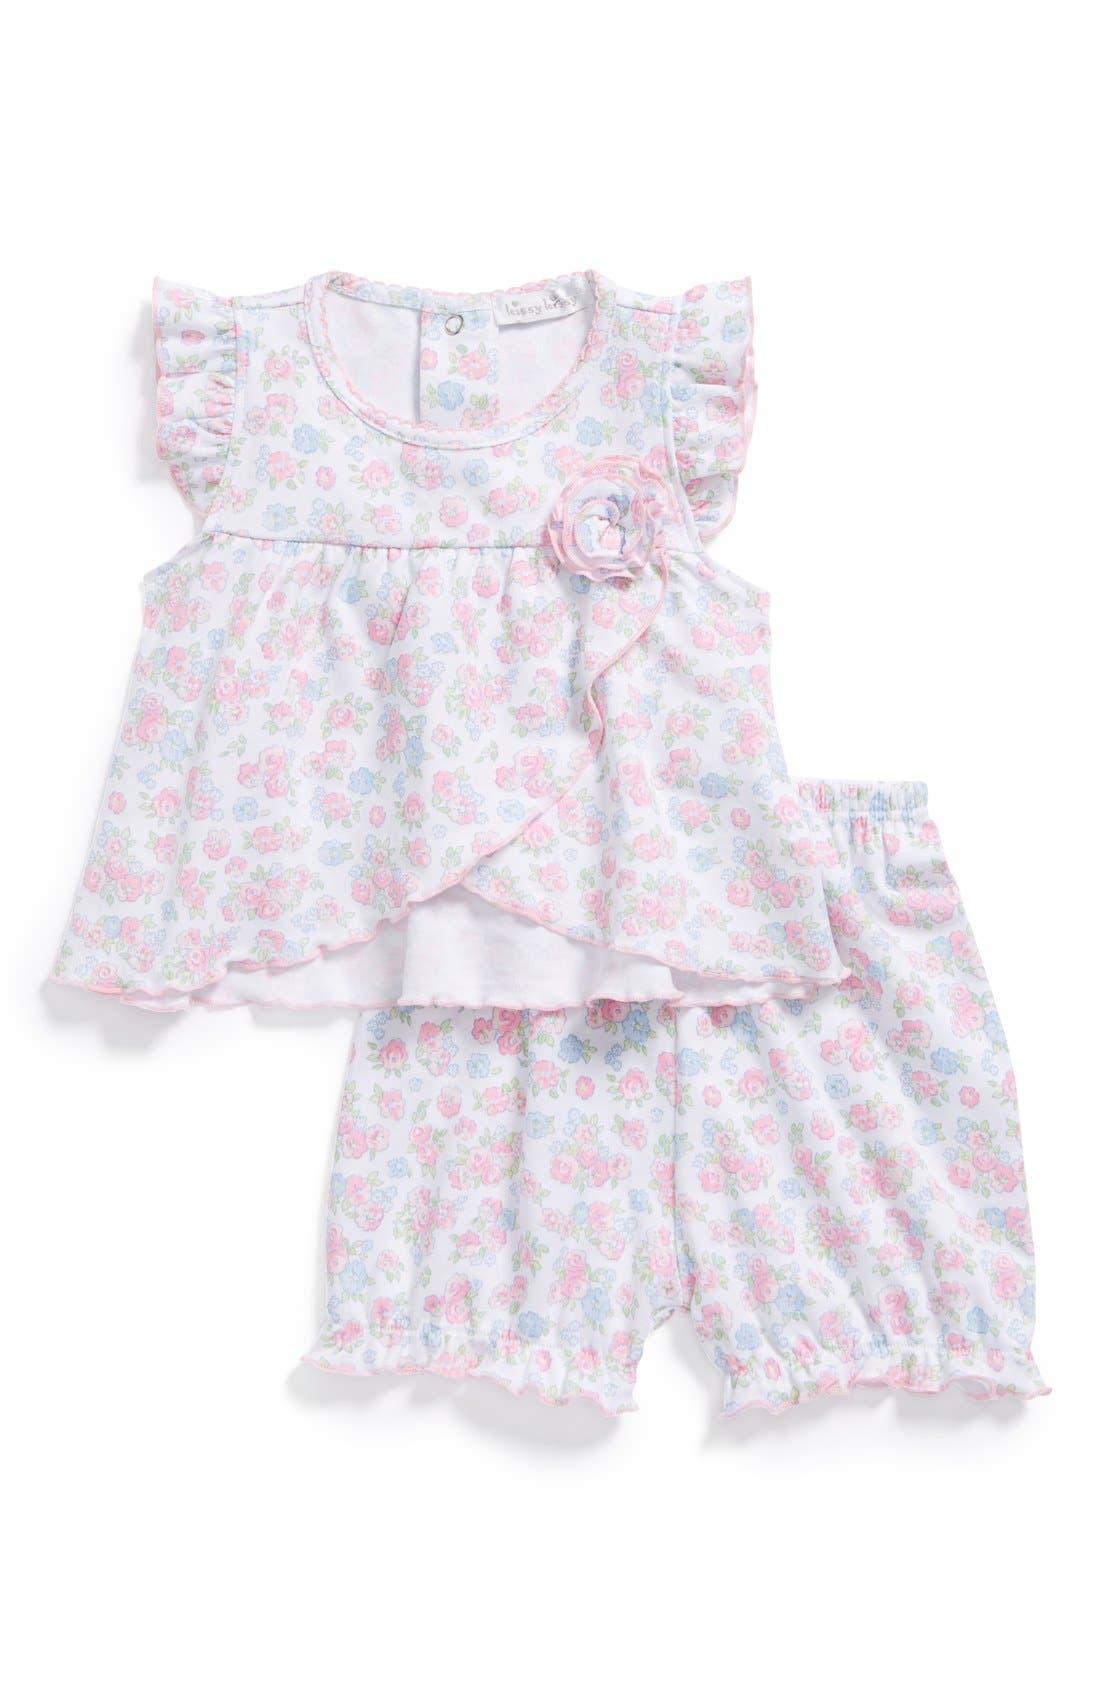 Main Image - Kissy Kissy 'Summer Splendor' Pima Cotton Tunic & Shorts (Baby Girls)